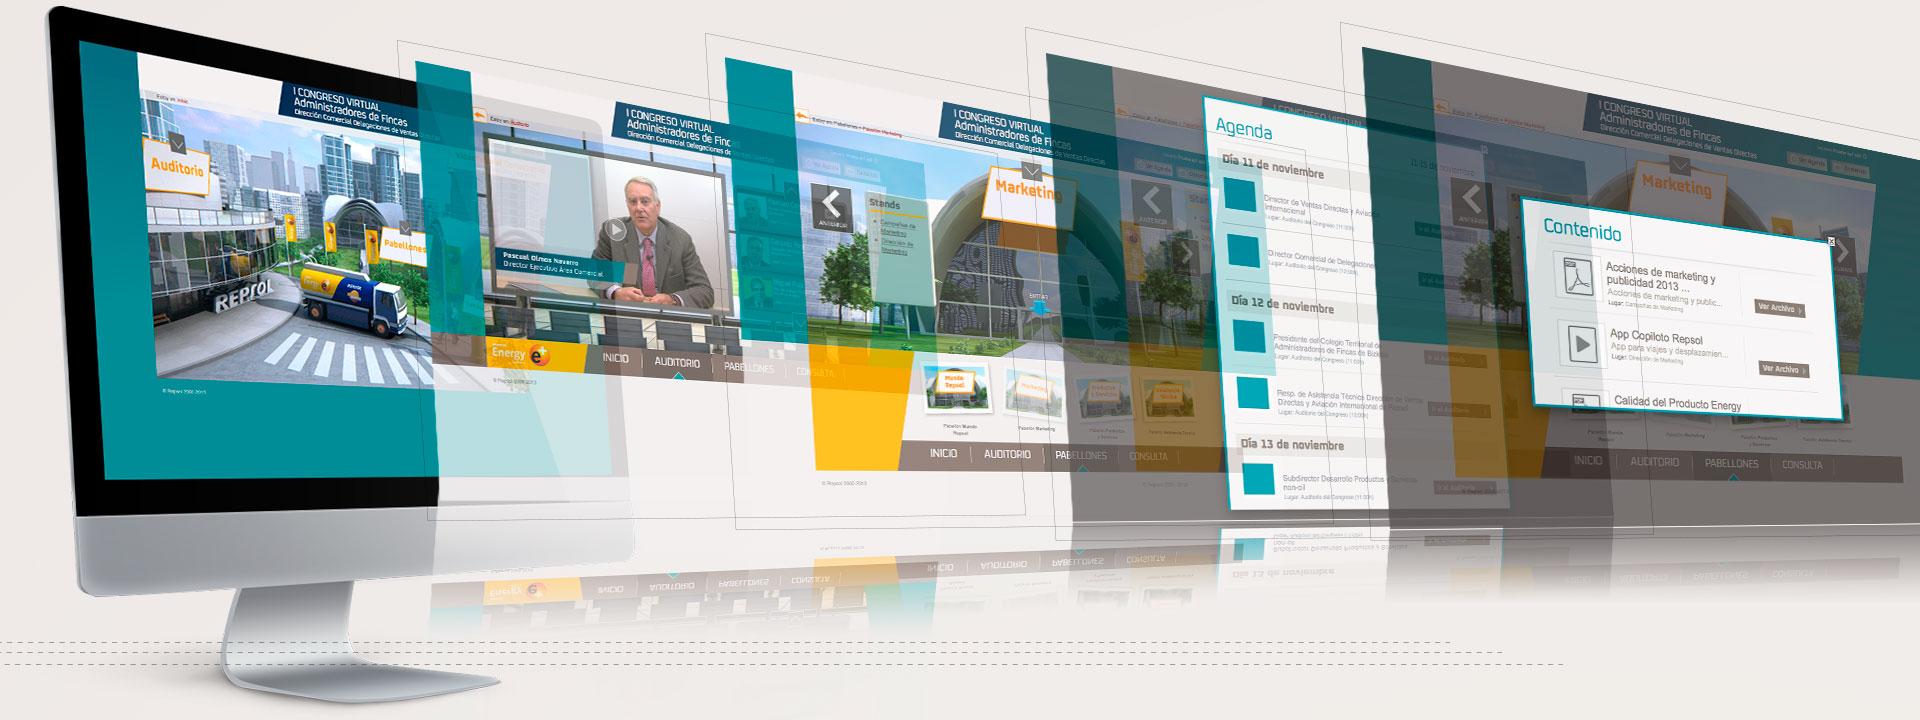 img_congres_virtual_repsol_big.jpg